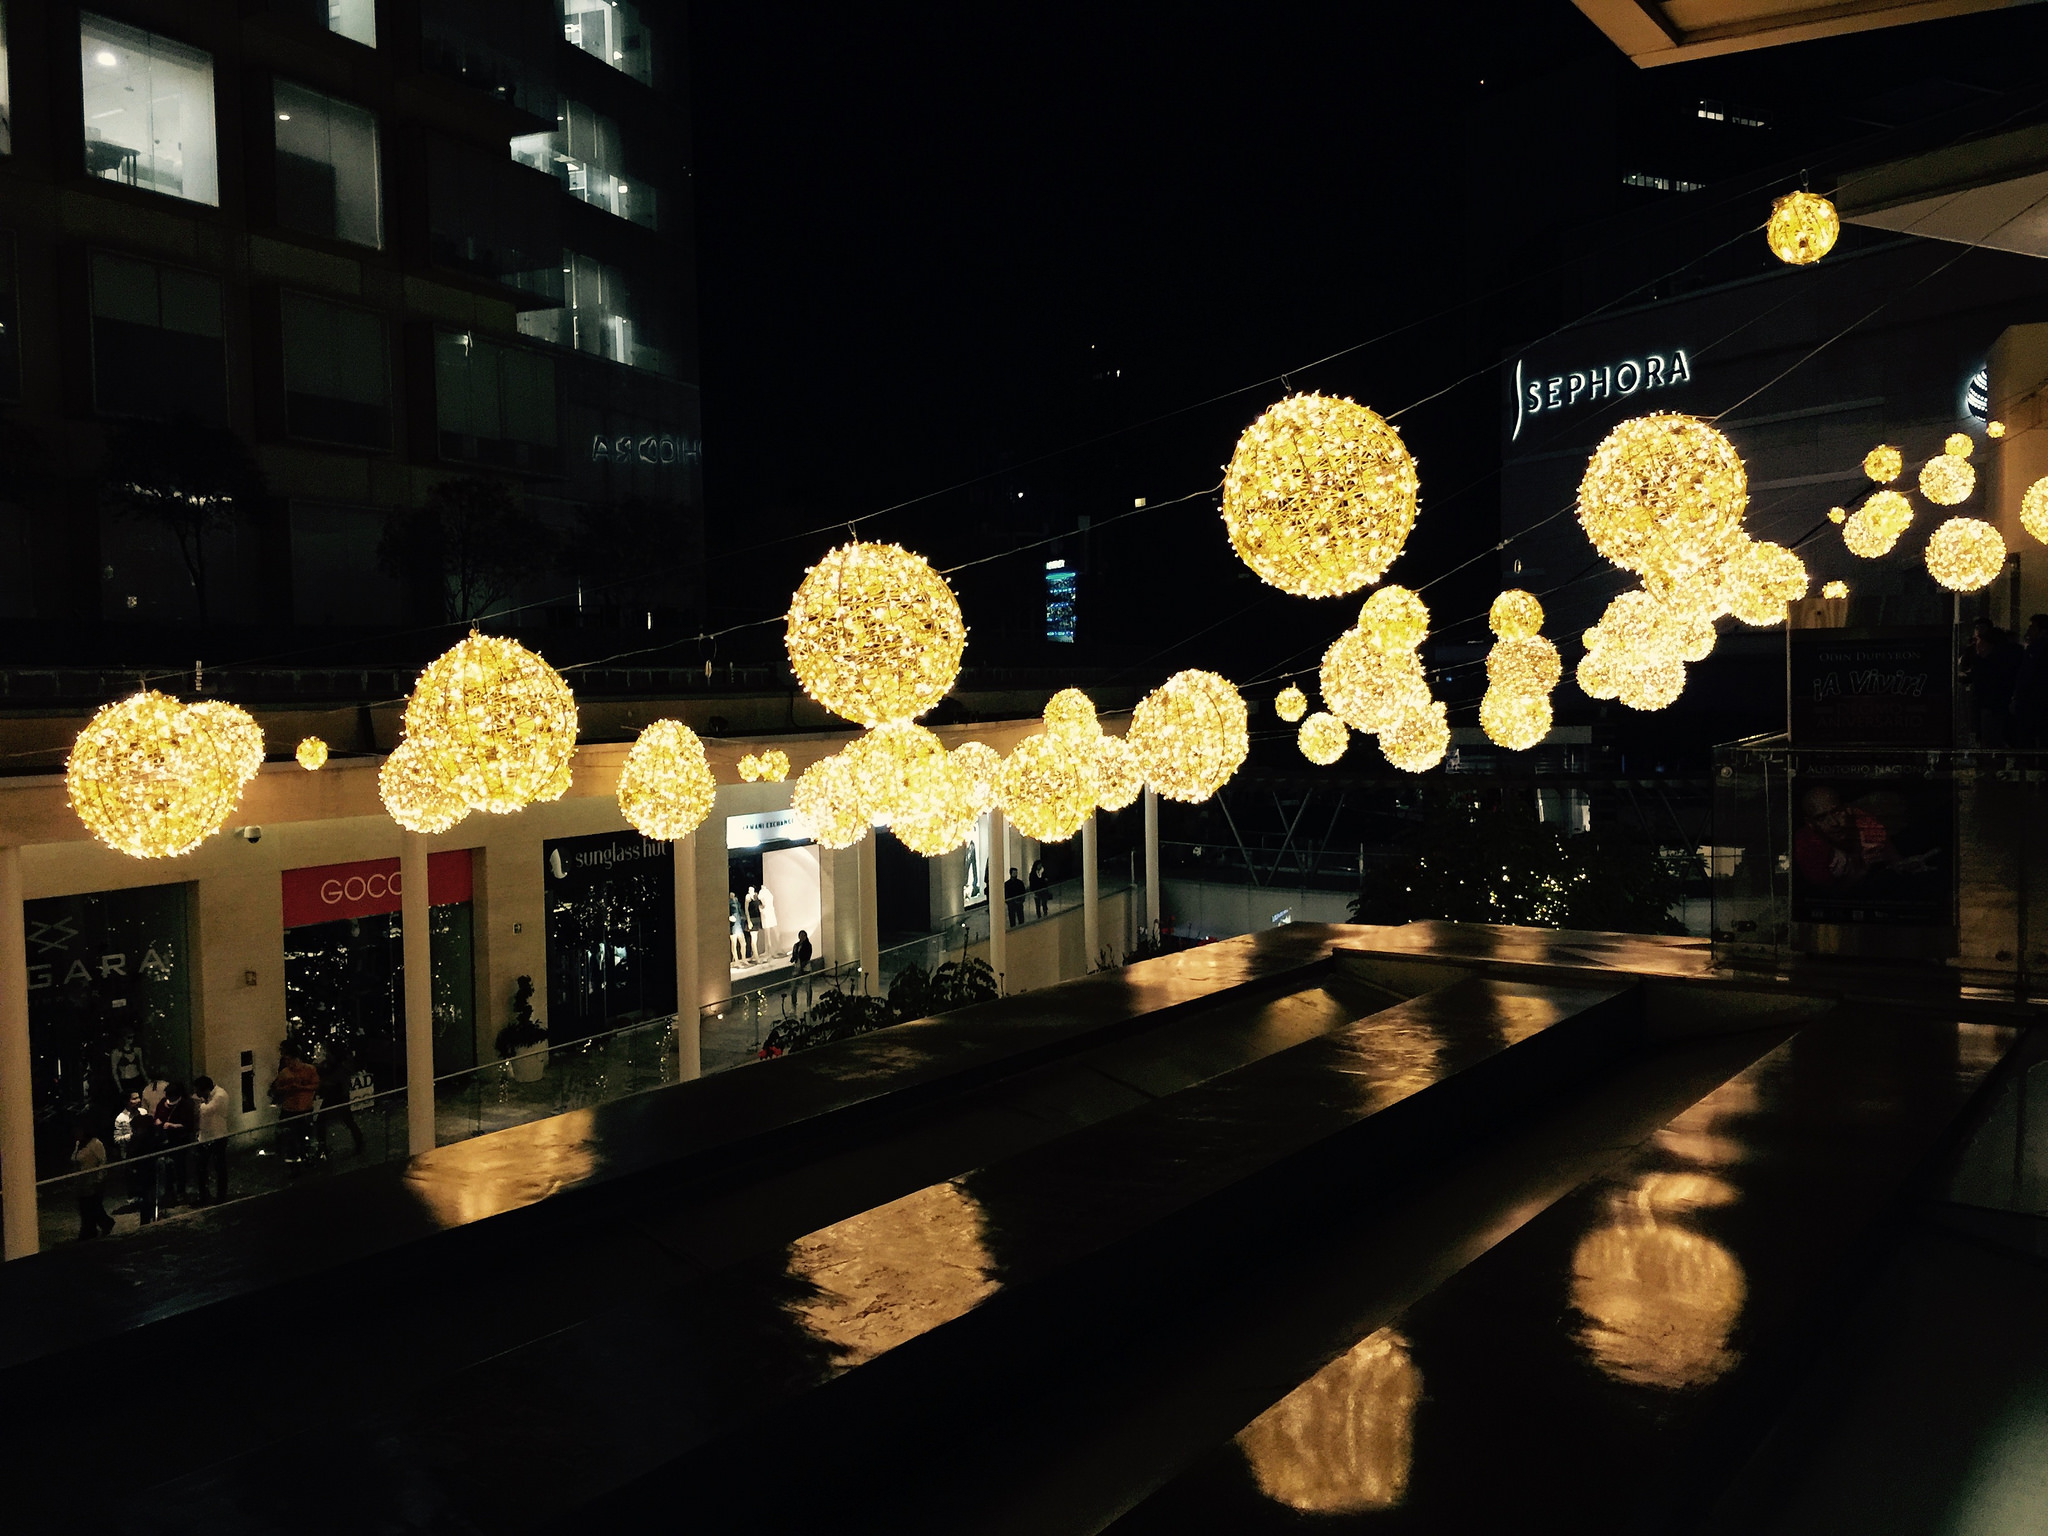 The swanky Antara Fashion Hall by night | © Daniel García Alvarado/Flickr